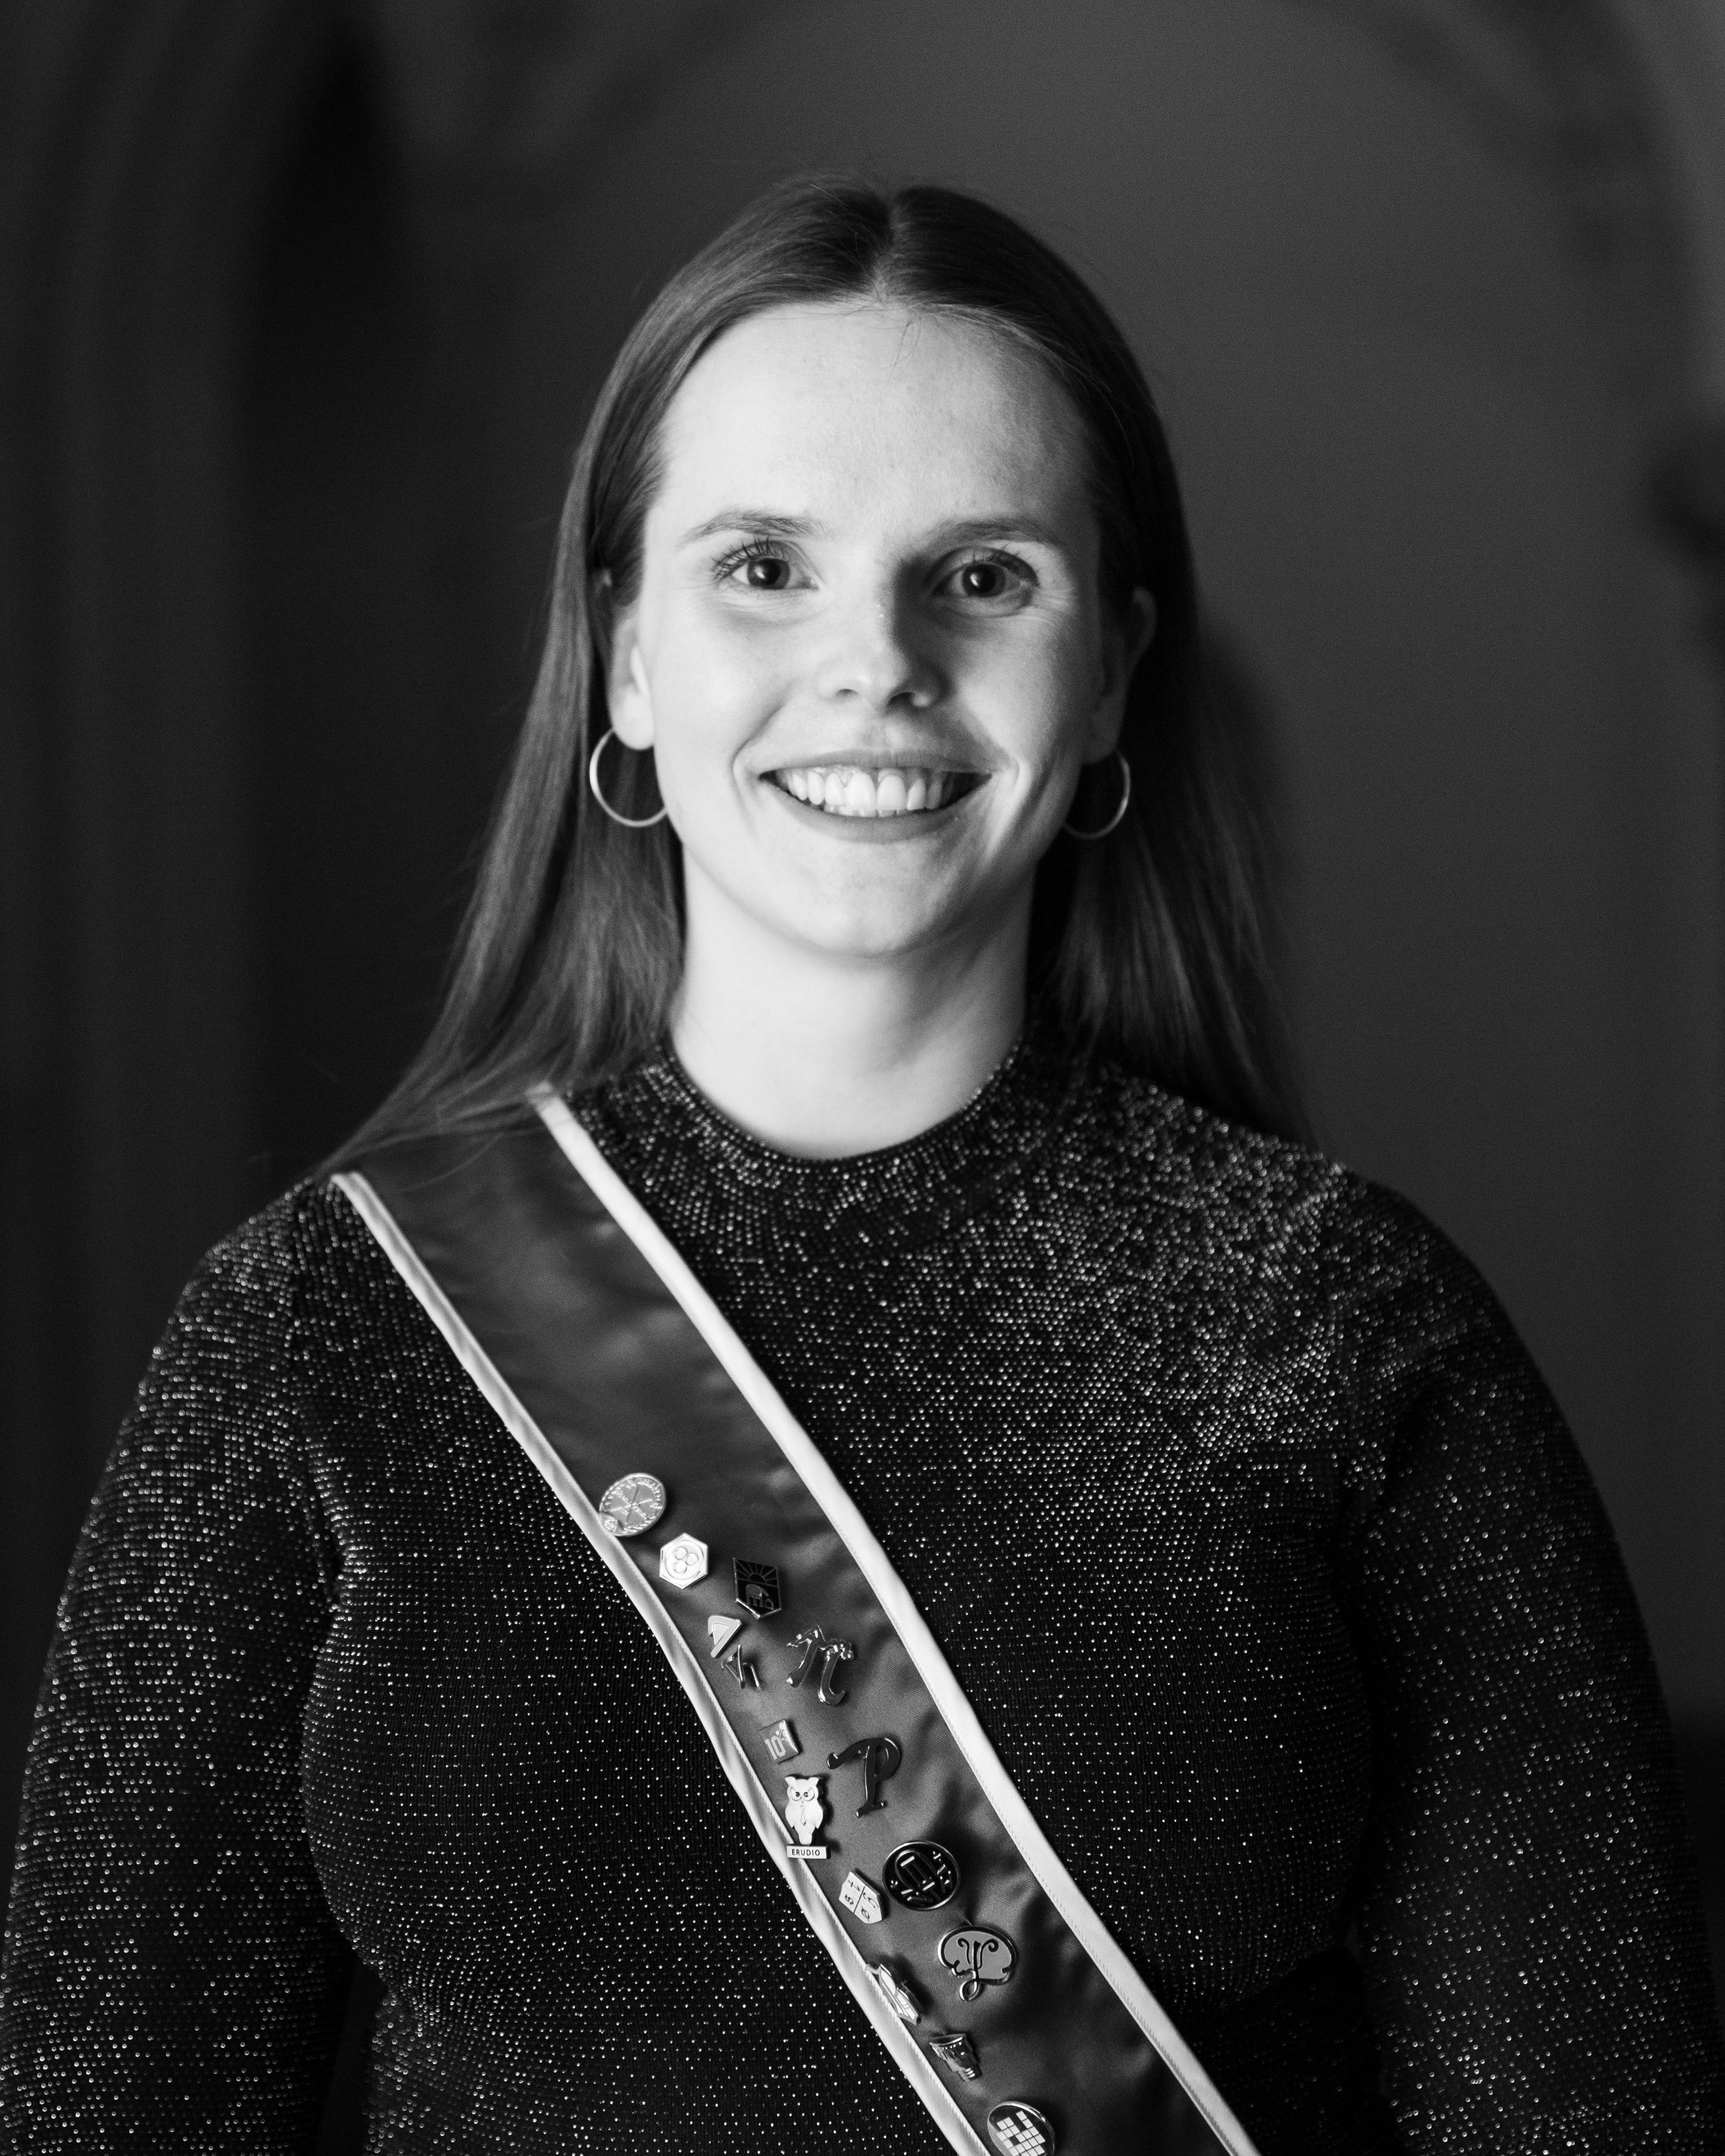 Ina Rosenhaug Bjørset